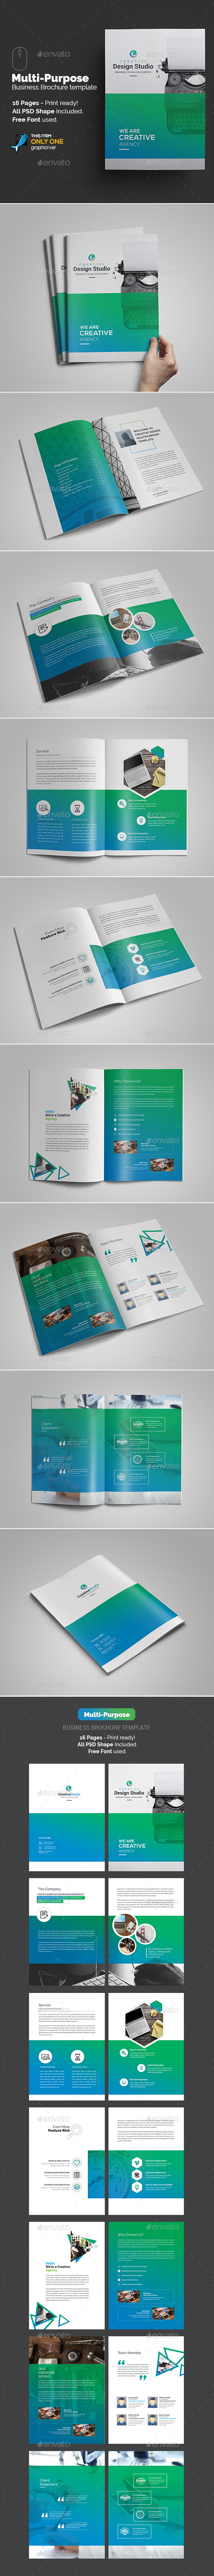 Multi-Purpose Agency Brochure Template - Brochures Print Templates